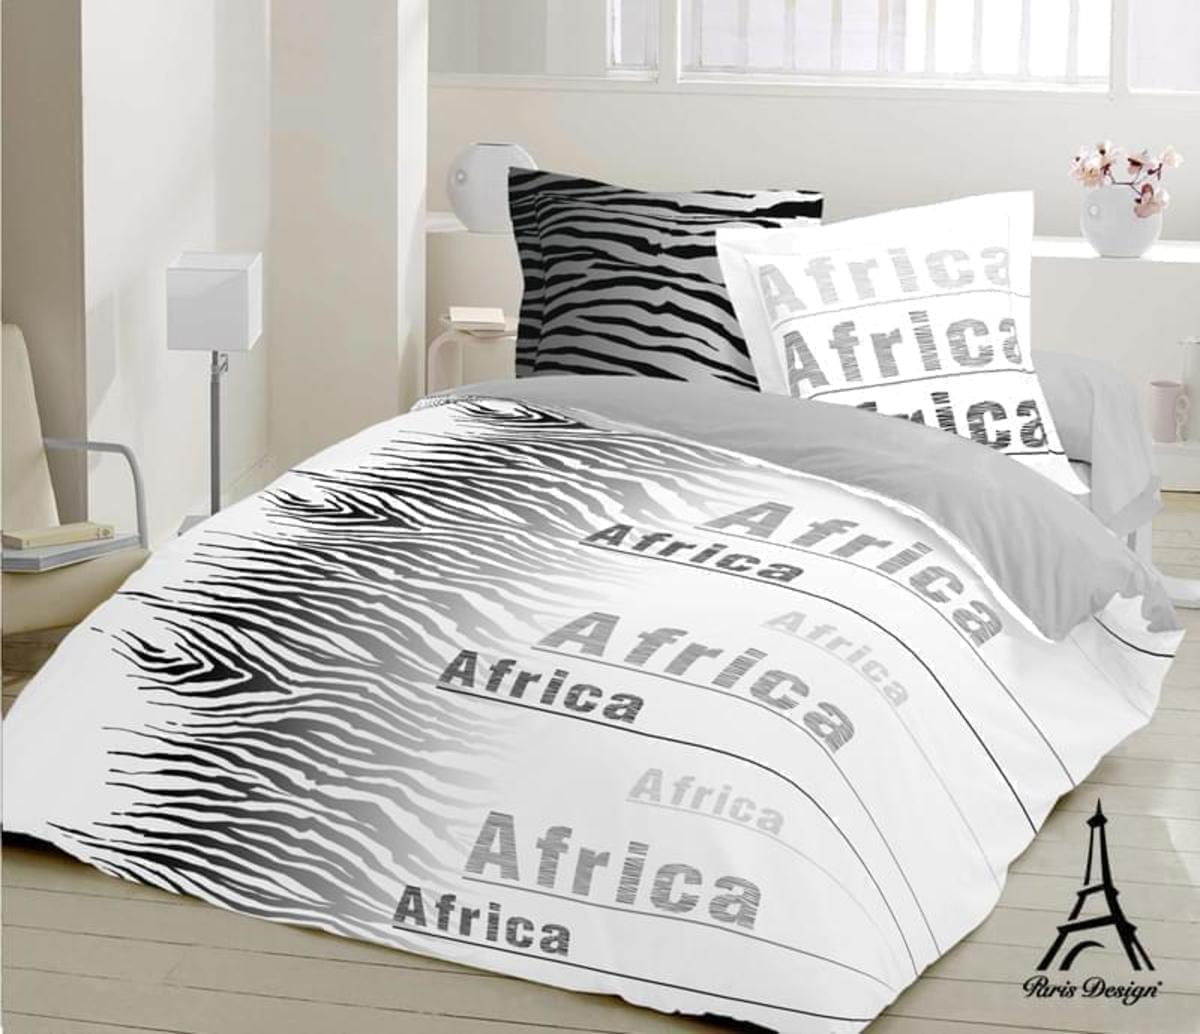 Paris design Povlečení bavlna exklusive Africa 140 x 220 cm + 70 x 90 cm